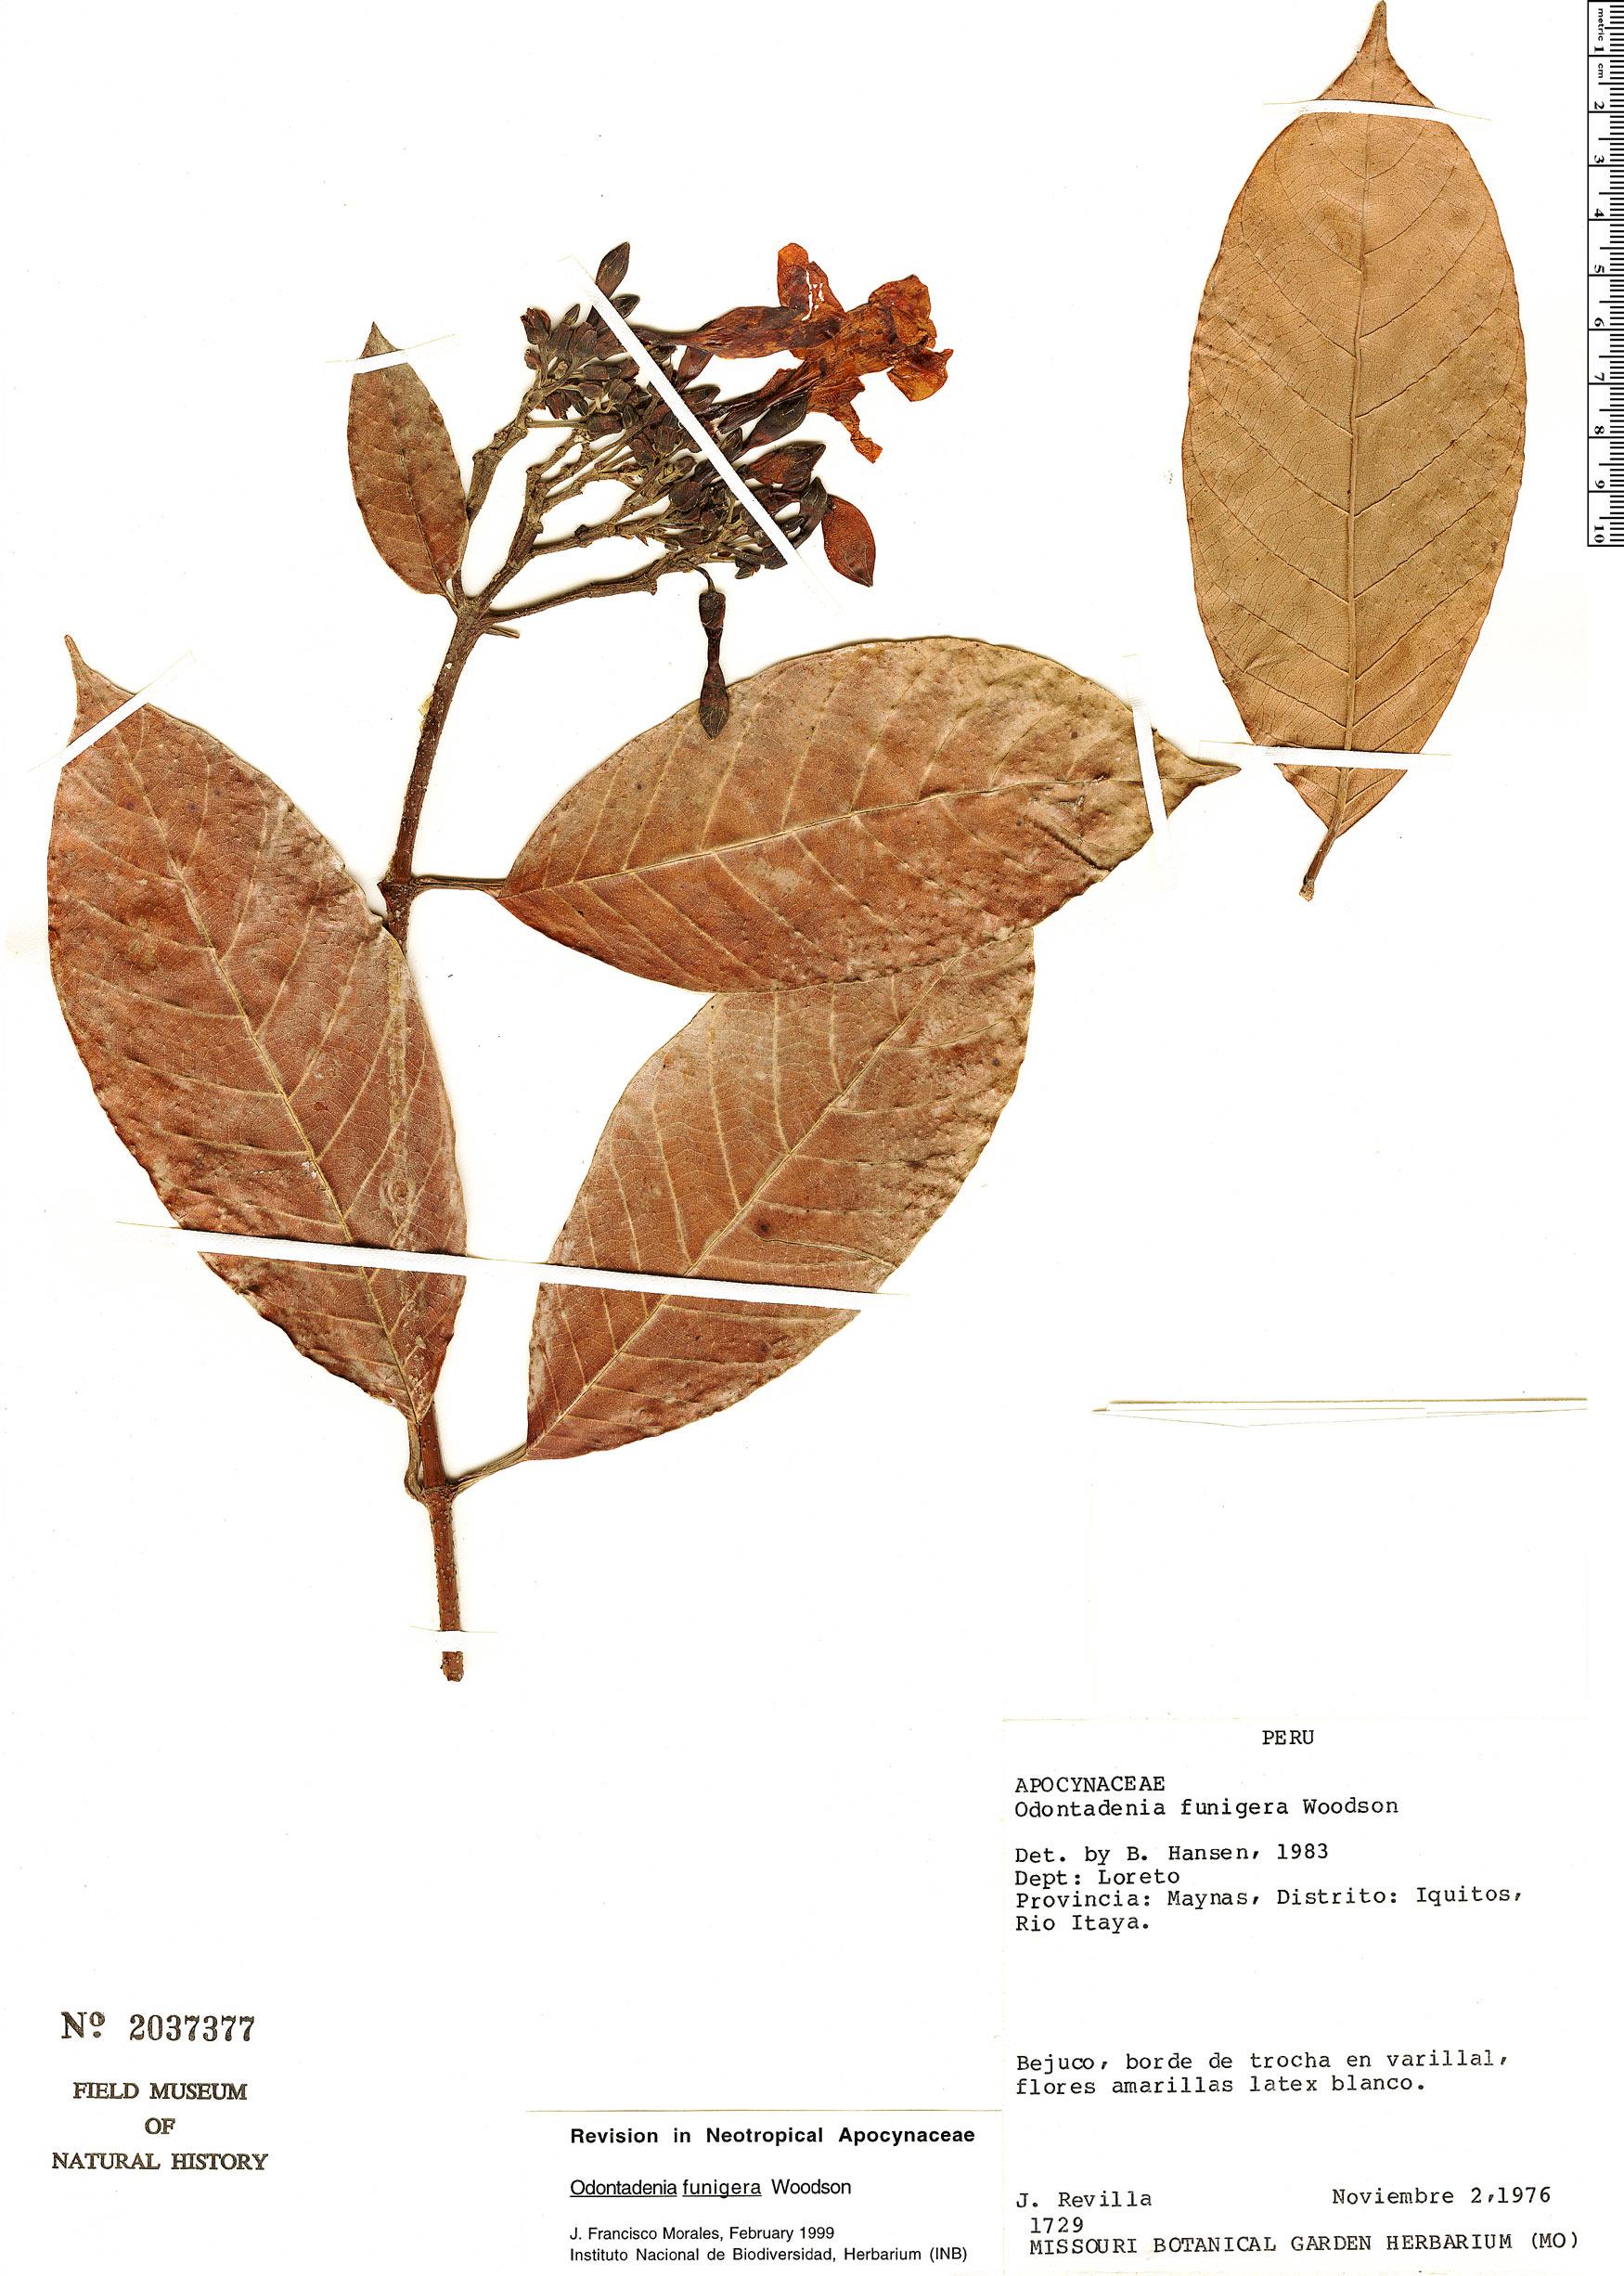 Specimen: Odontadenia funigera